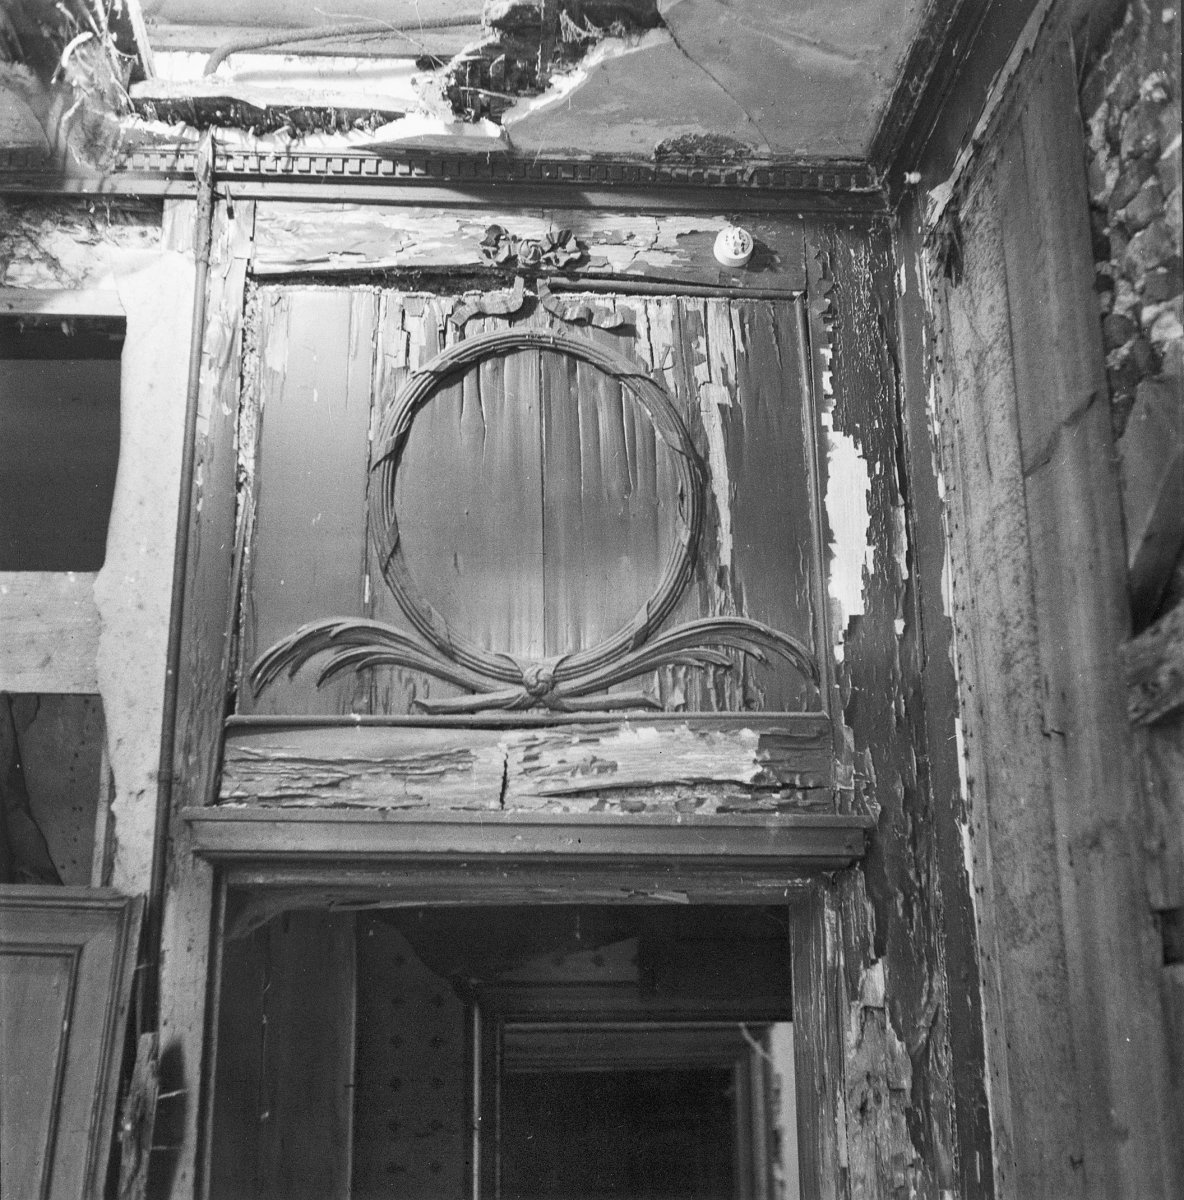 file dessus de porte linker middenvertrek velsen 20240352 wikimedia commons. Black Bedroom Furniture Sets. Home Design Ideas